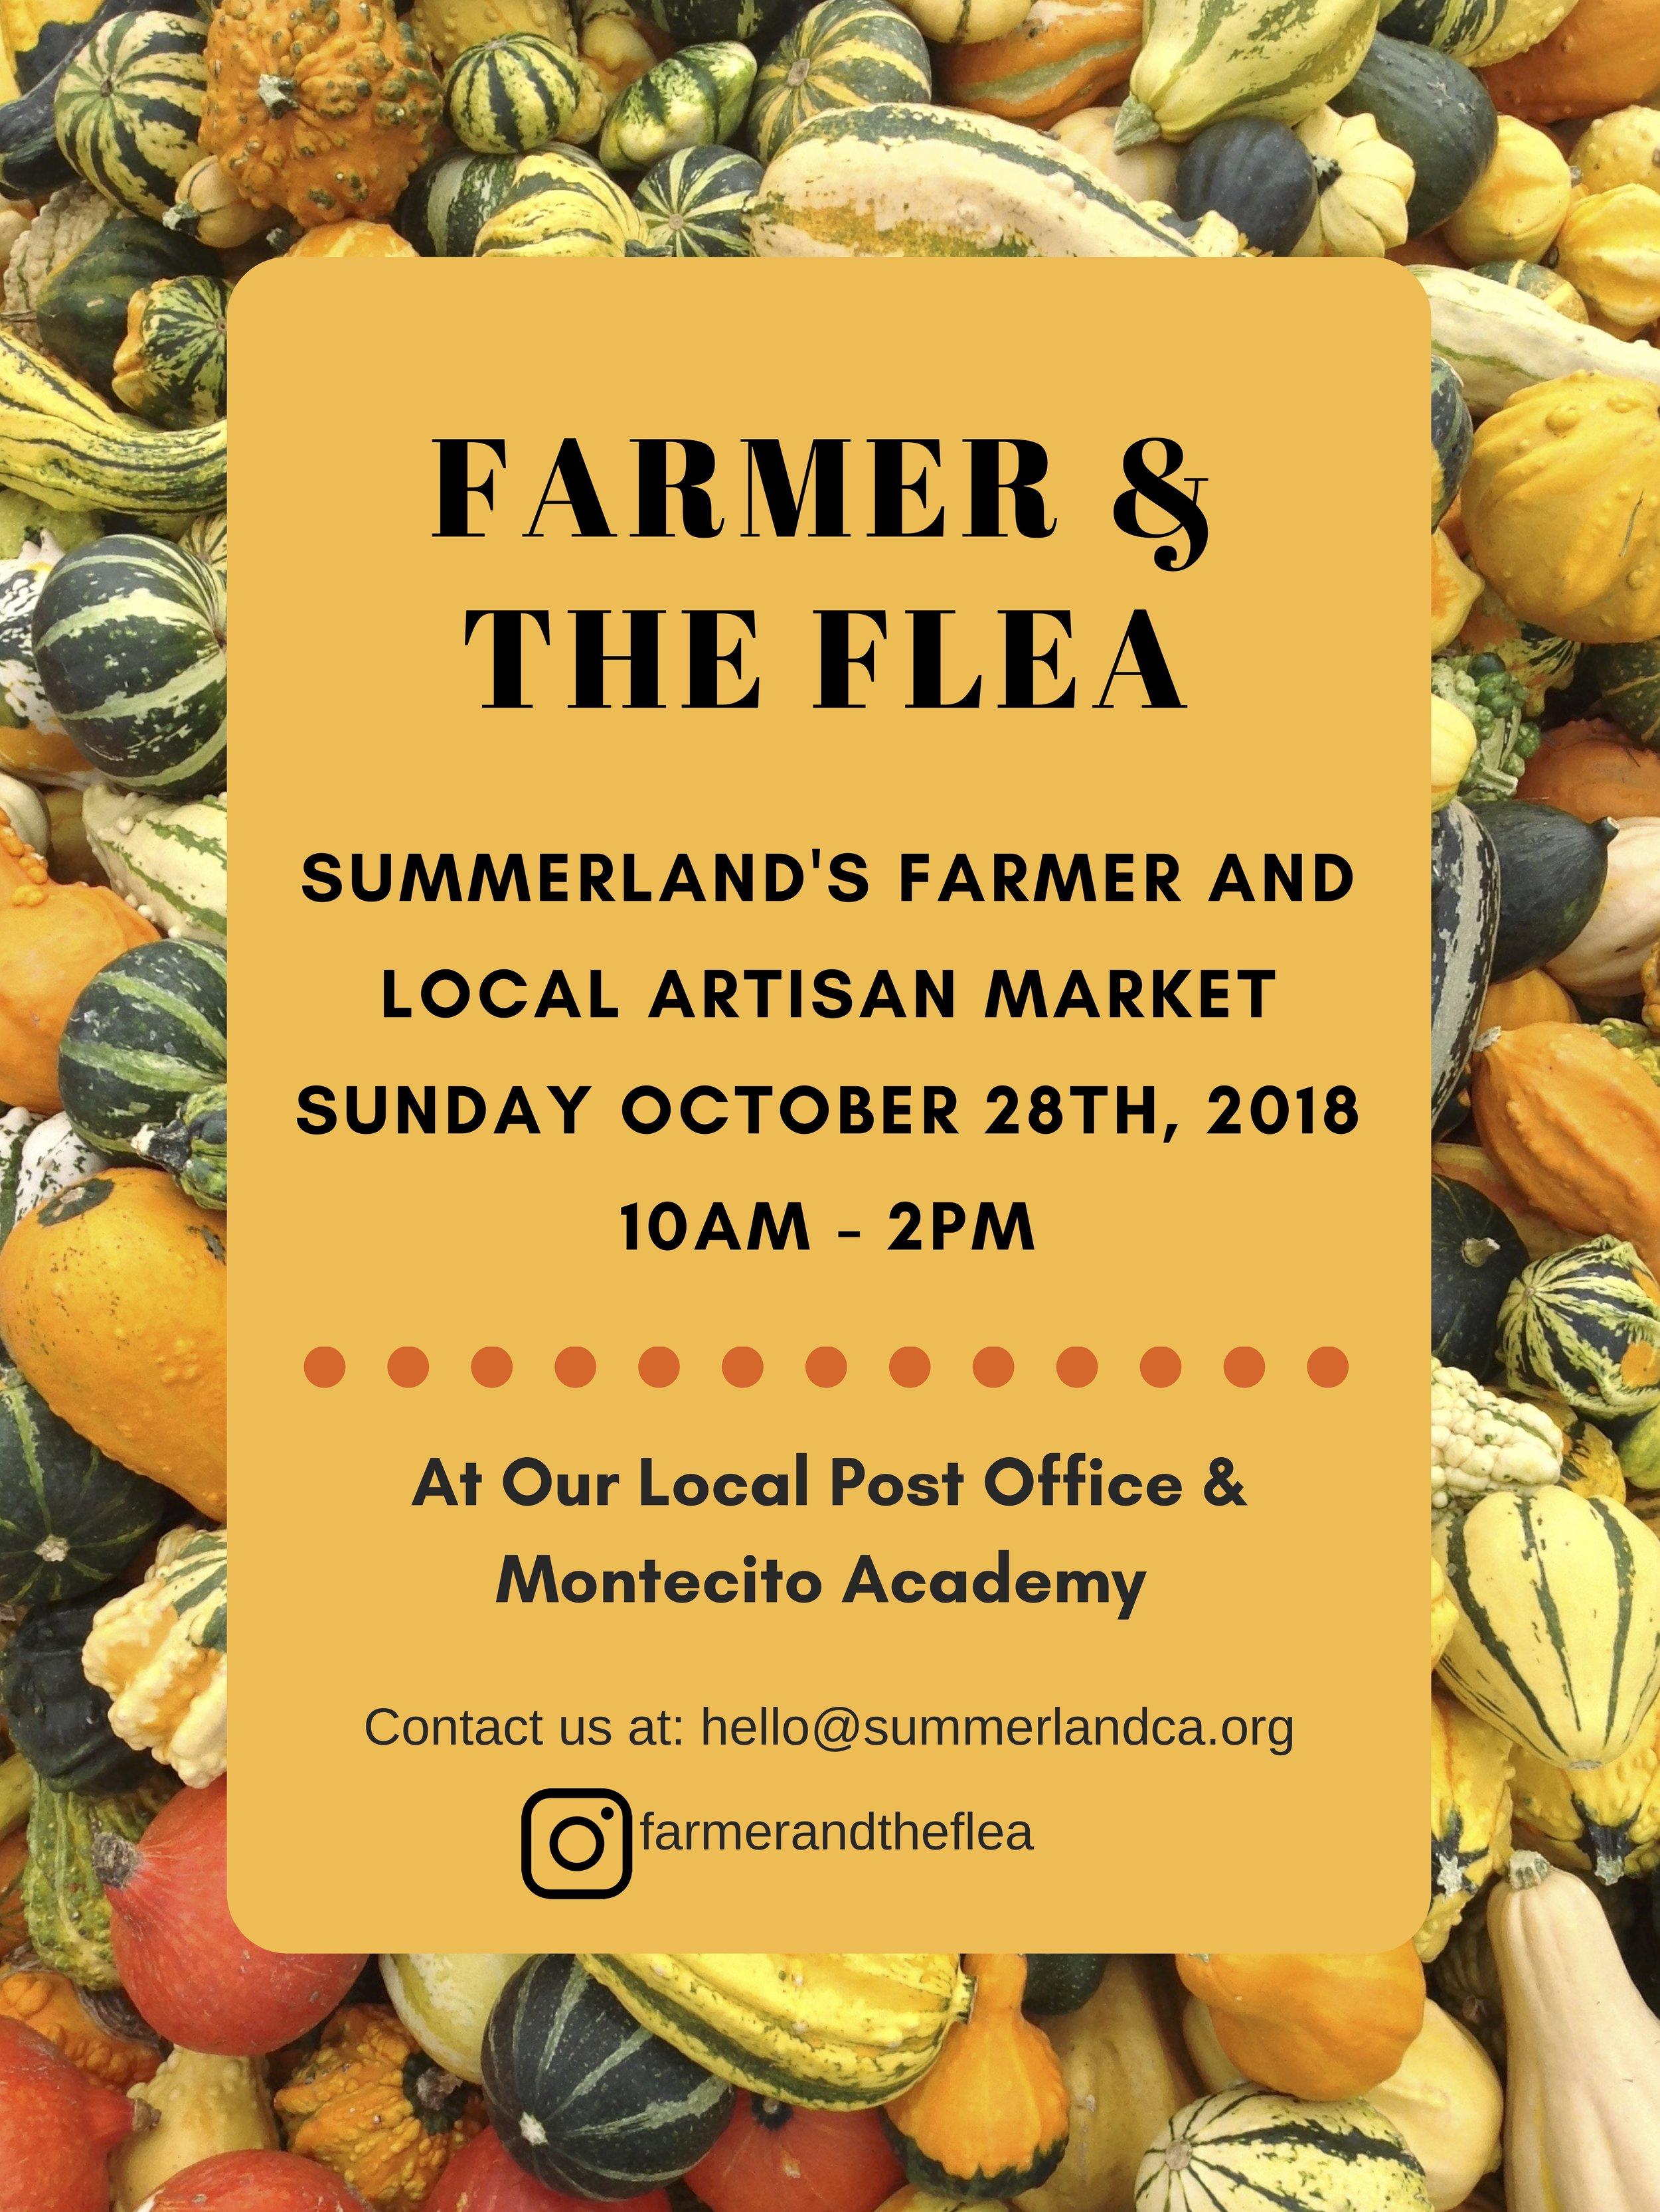 Farmer & the Flea Oct 28 Final.jpg